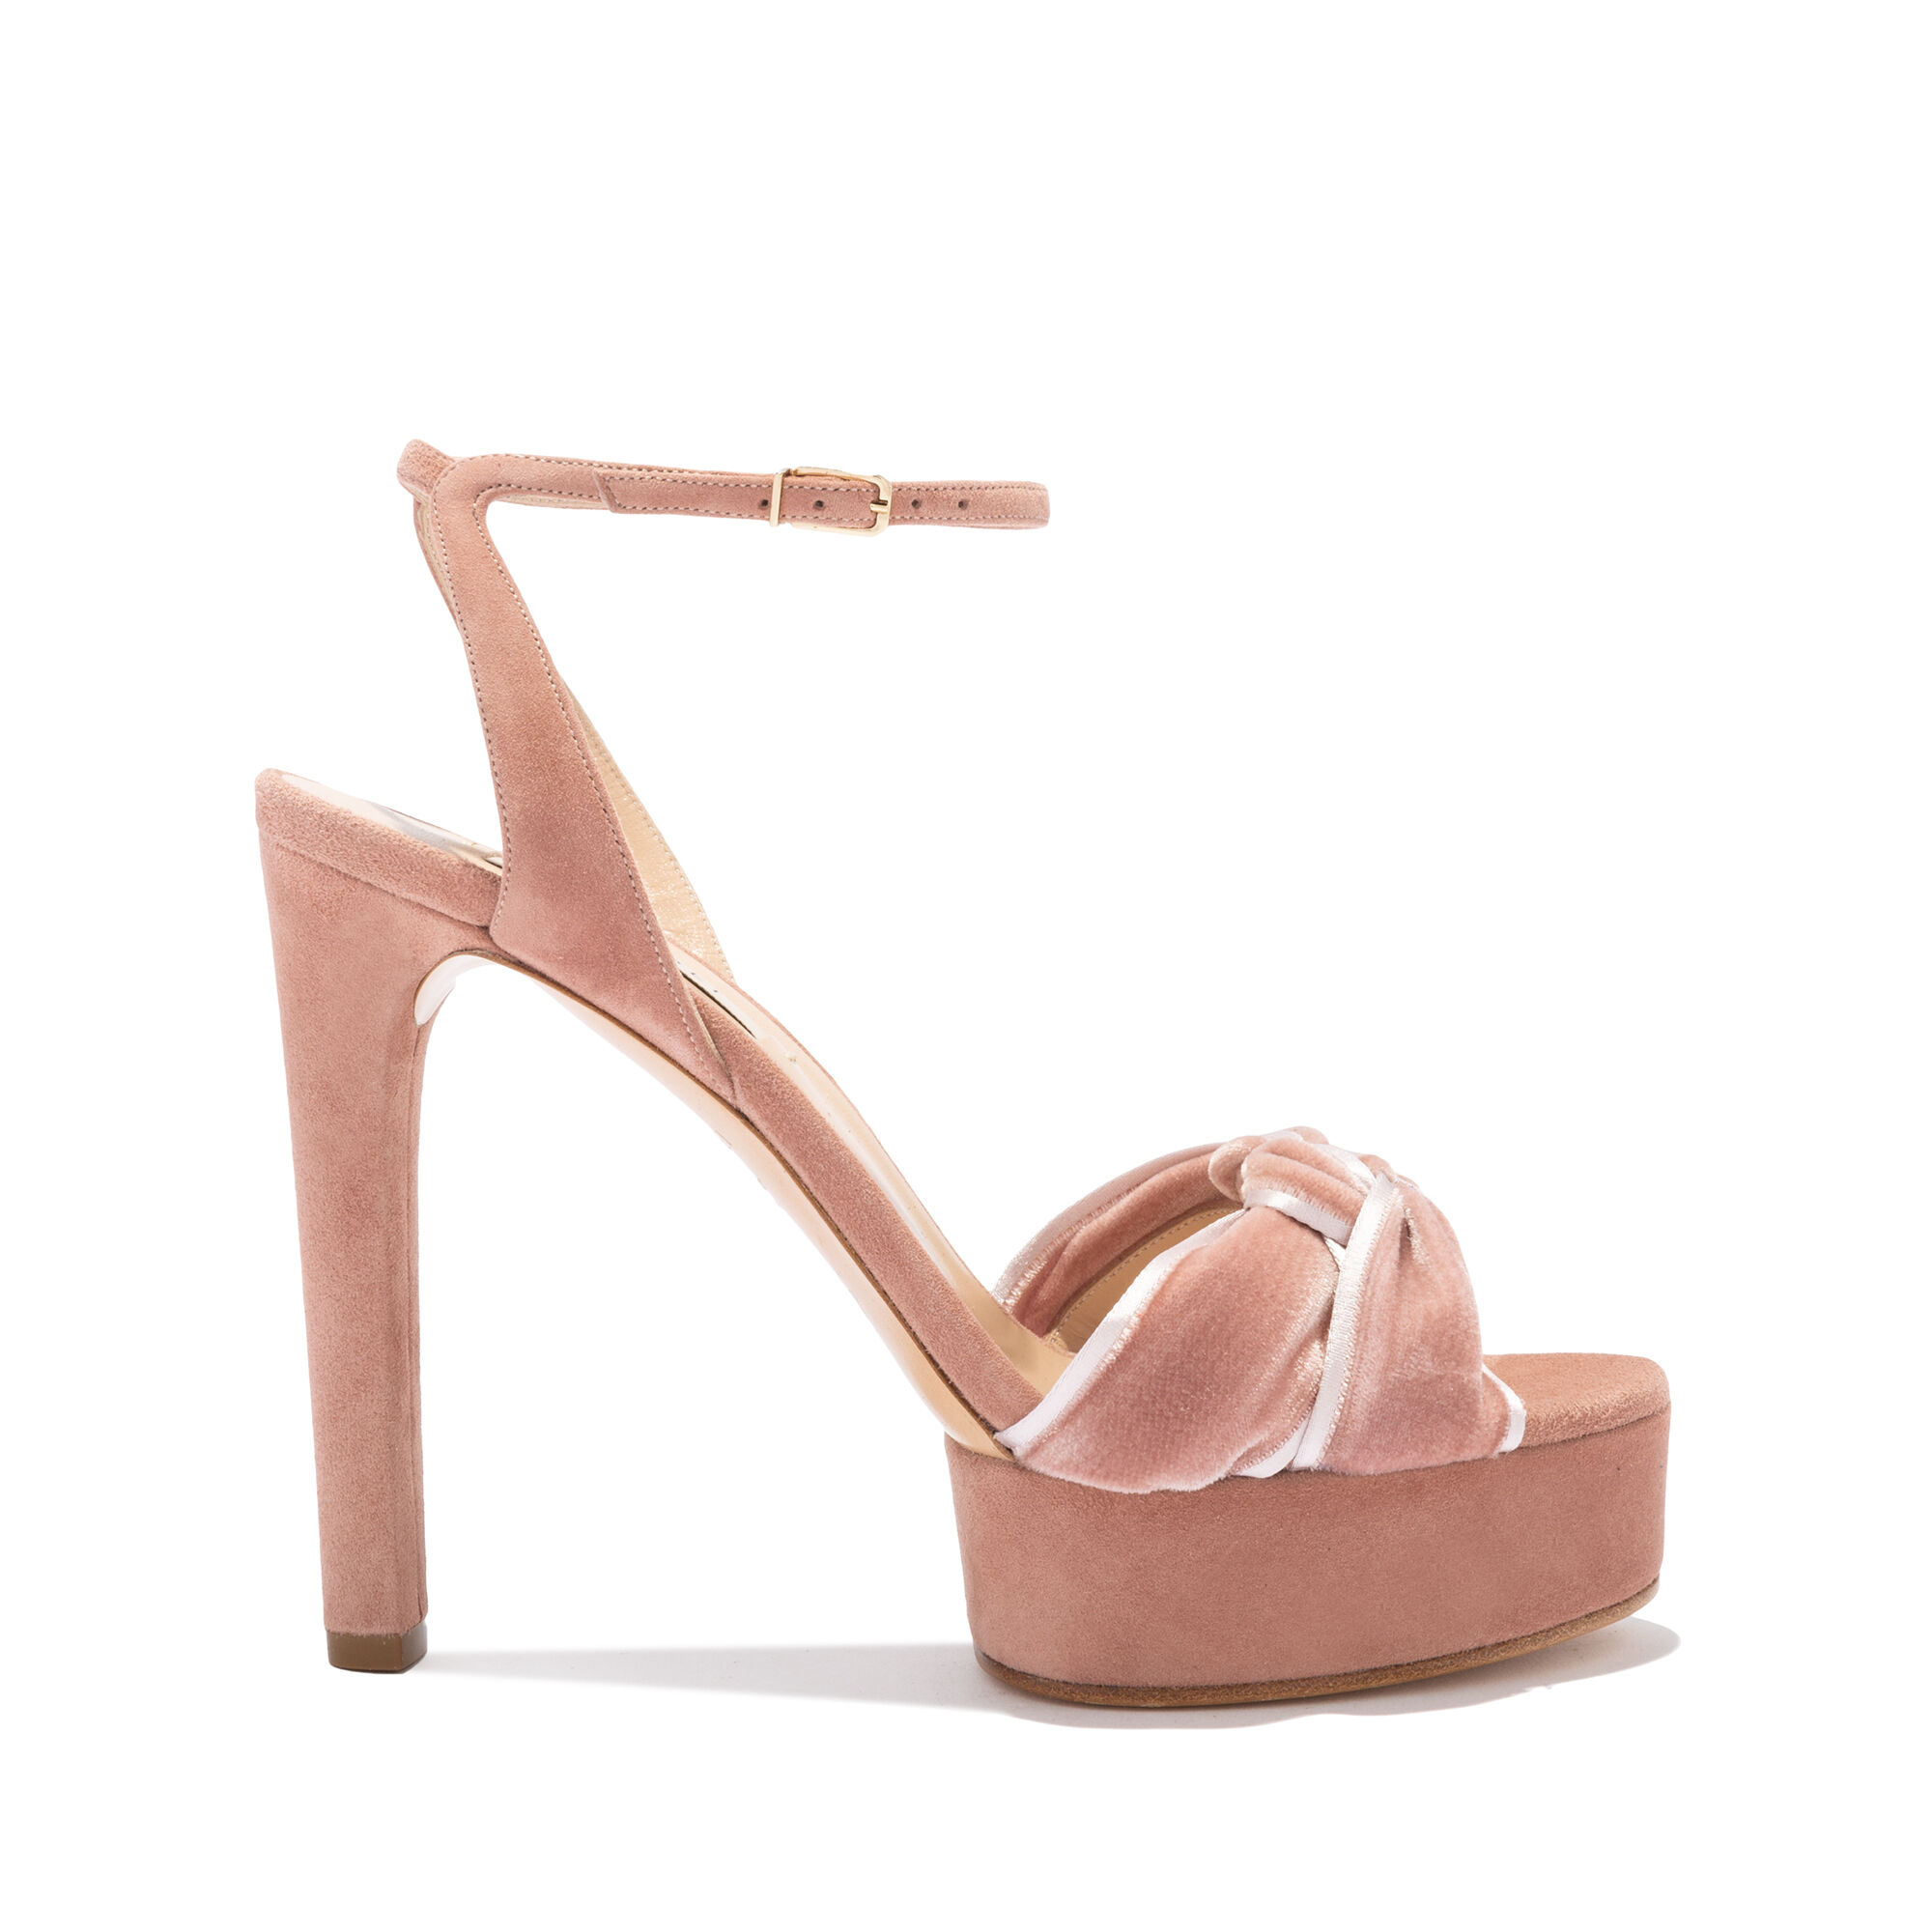 Women's Designer Platforms Shoes | Casadei